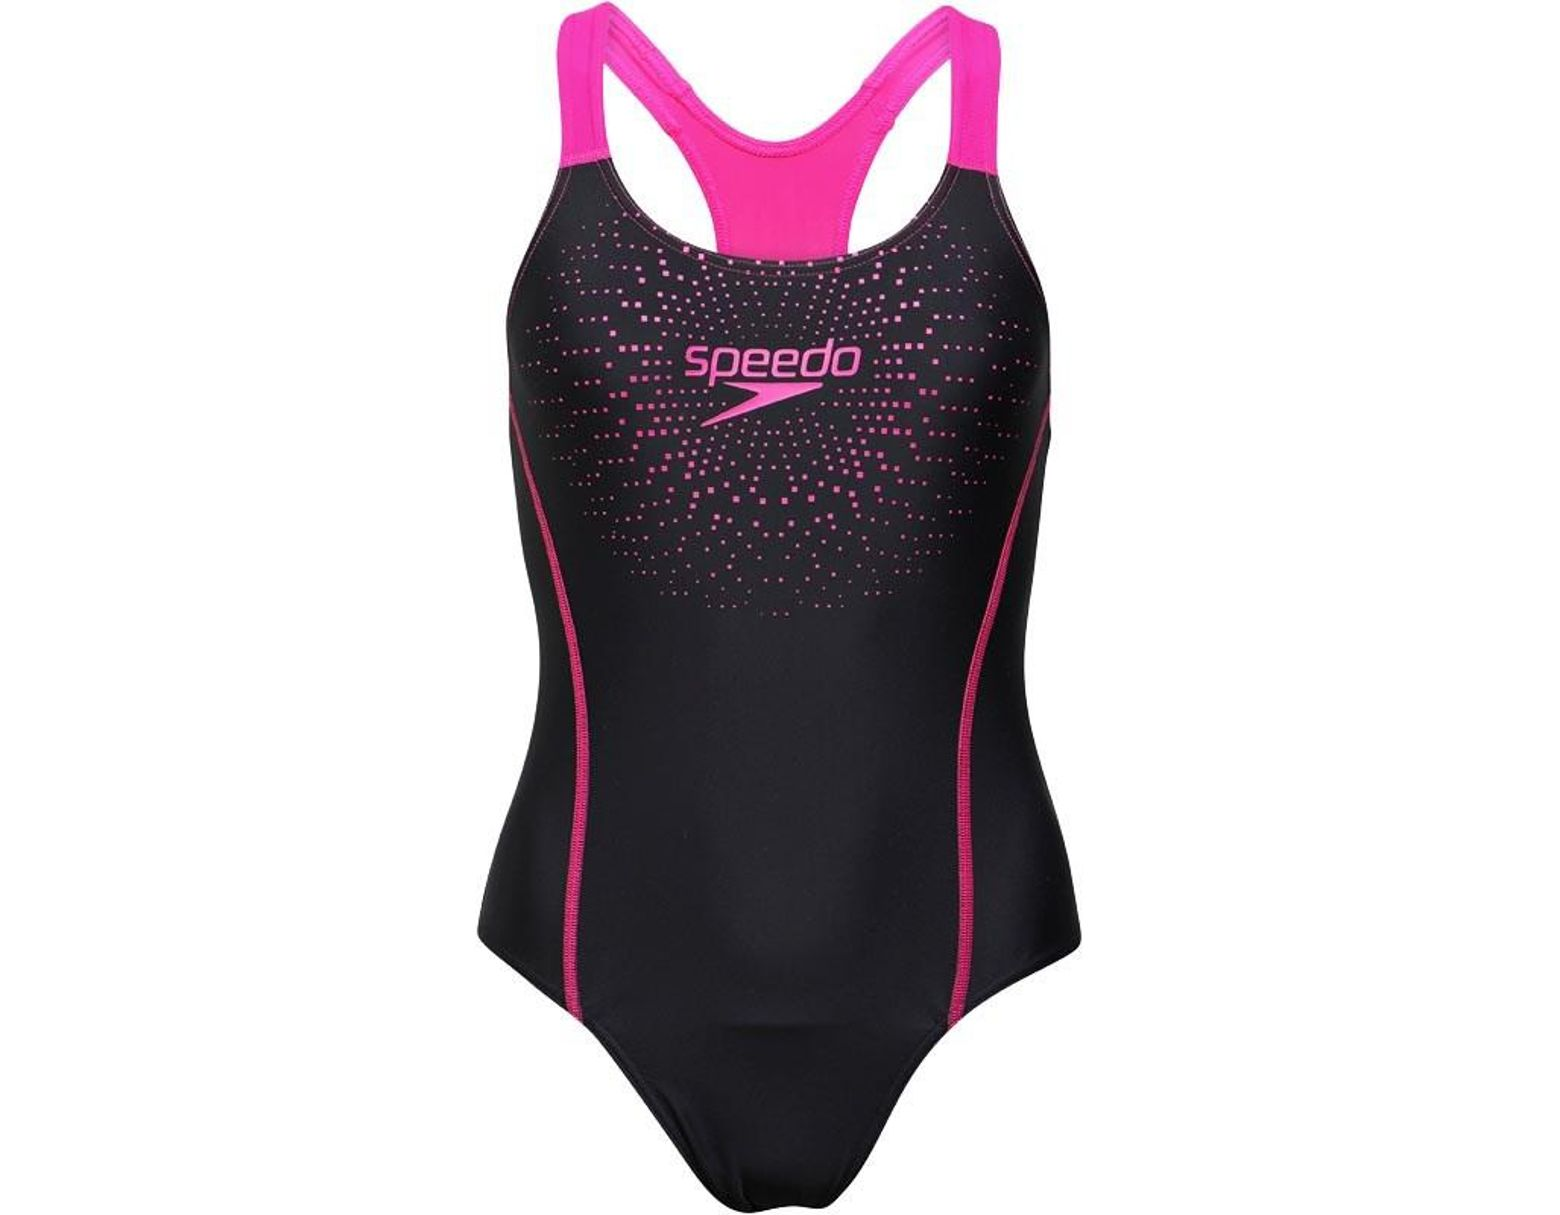 d22036c8fa5 Speedo Gala Logo Medalist One Piece Swimsuit Black/pink in Black - Lyst